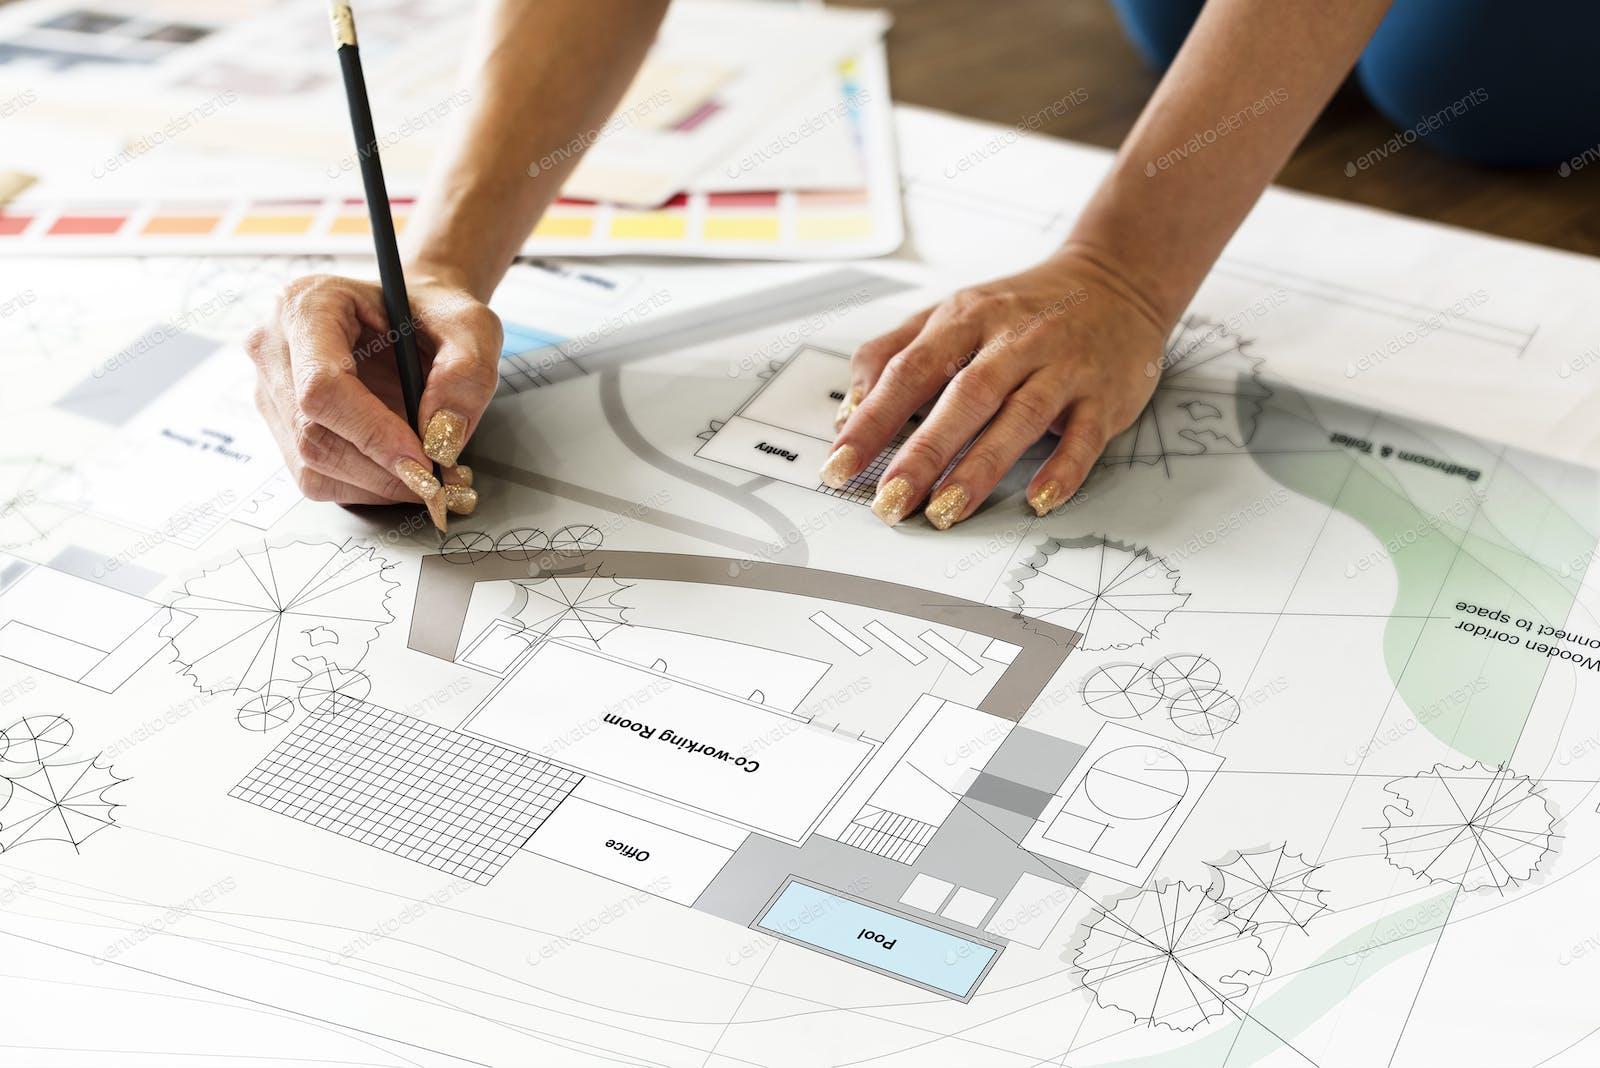 Design Studio Architect Creative Occupation Blueprint Concept Photo By Rawpixel On Envato Elements